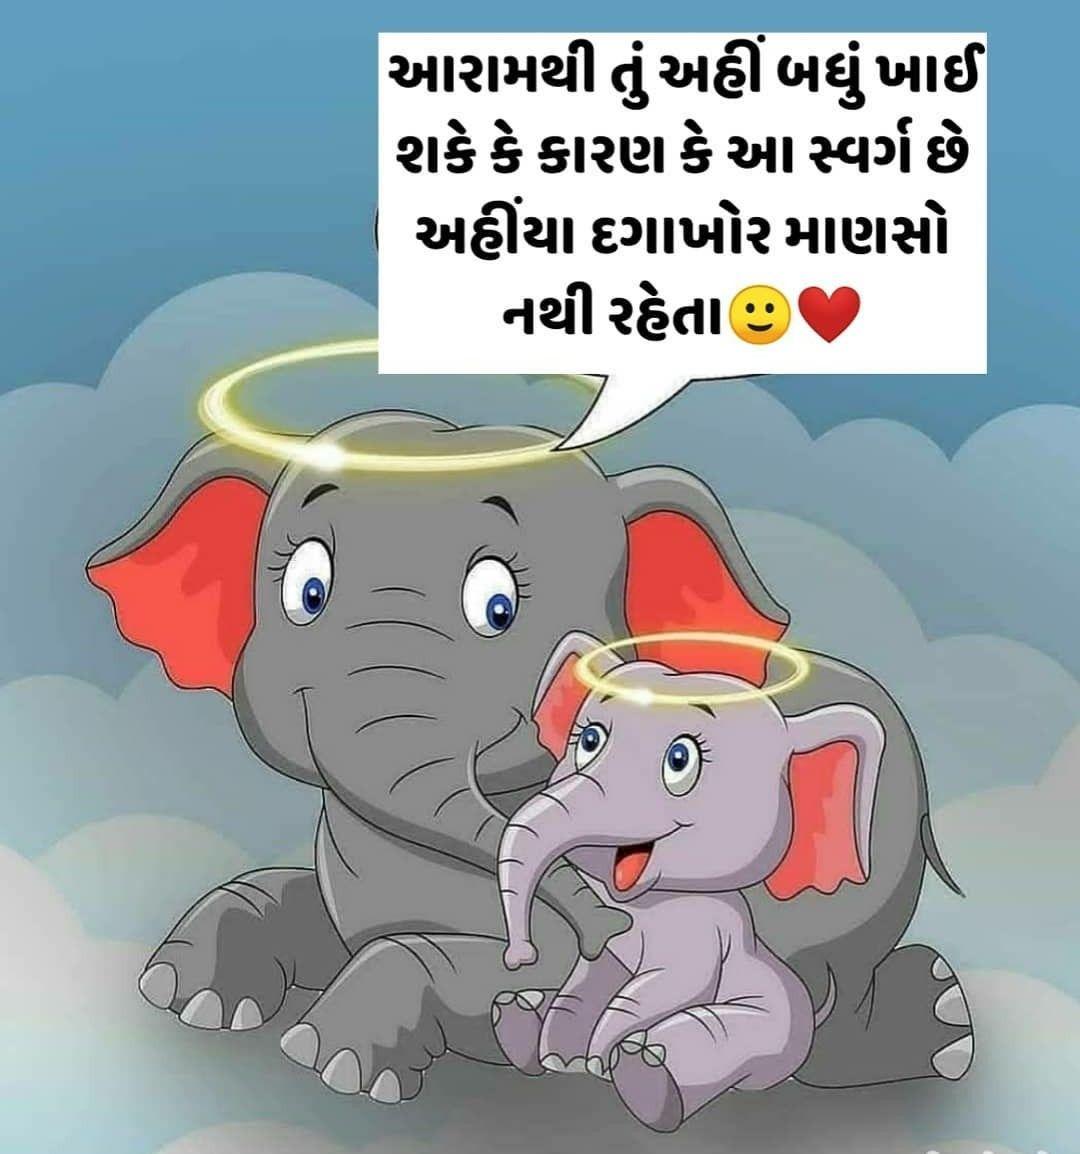 Pin by Ajay Dalal on Love u♥️ in 2020 Animals, Elephant